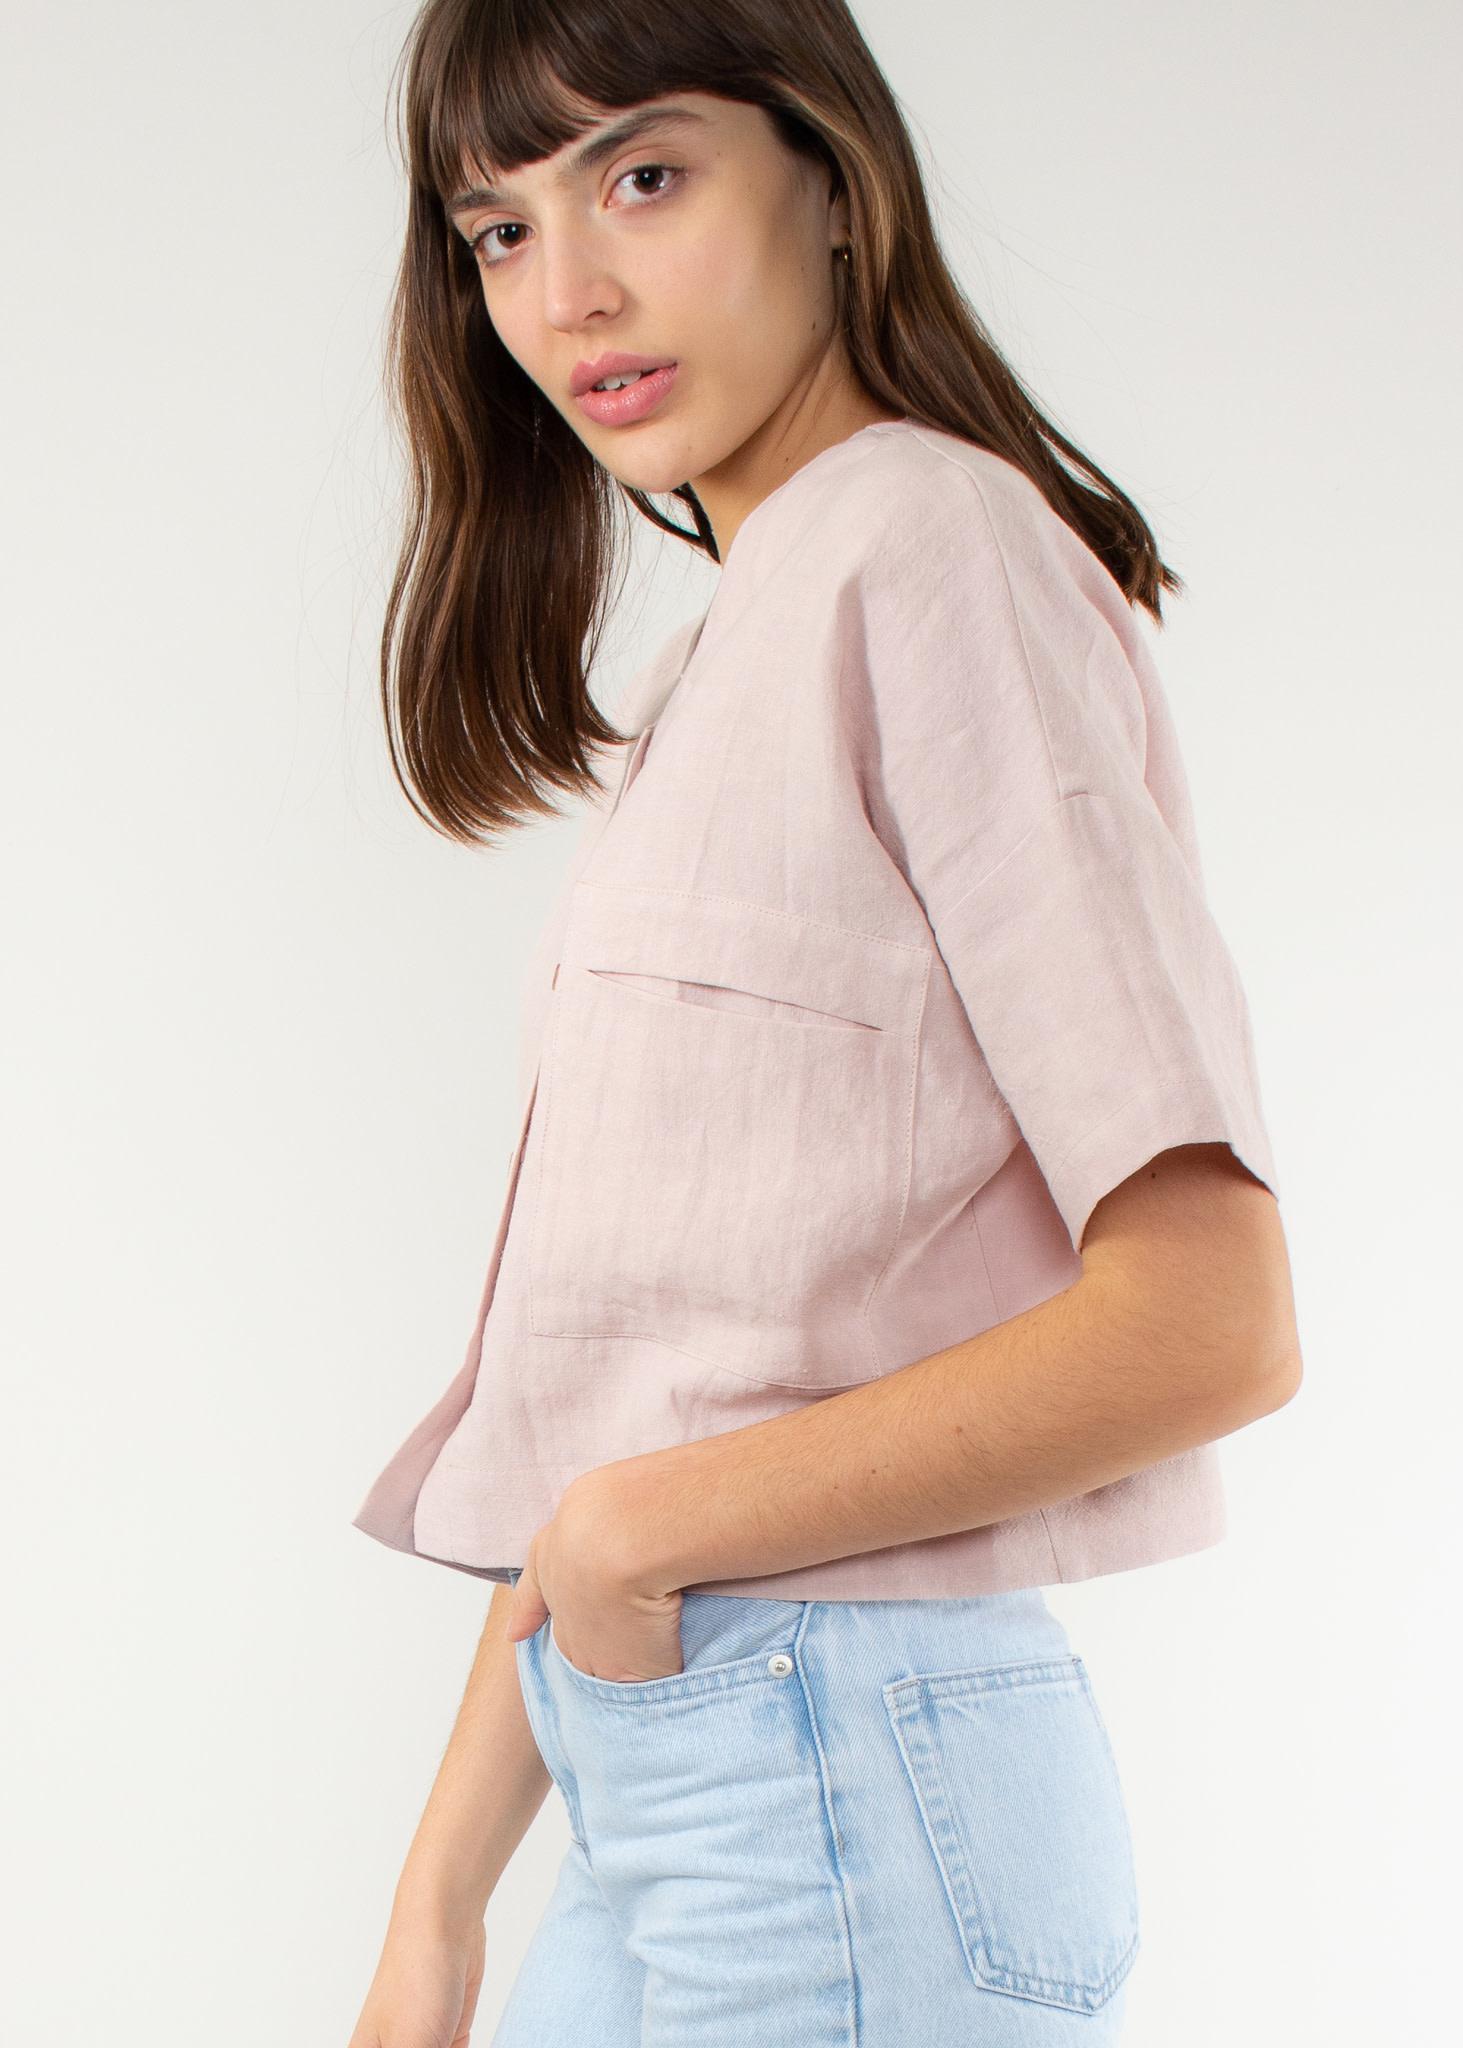 EVE GRAVEL Marthe shirt